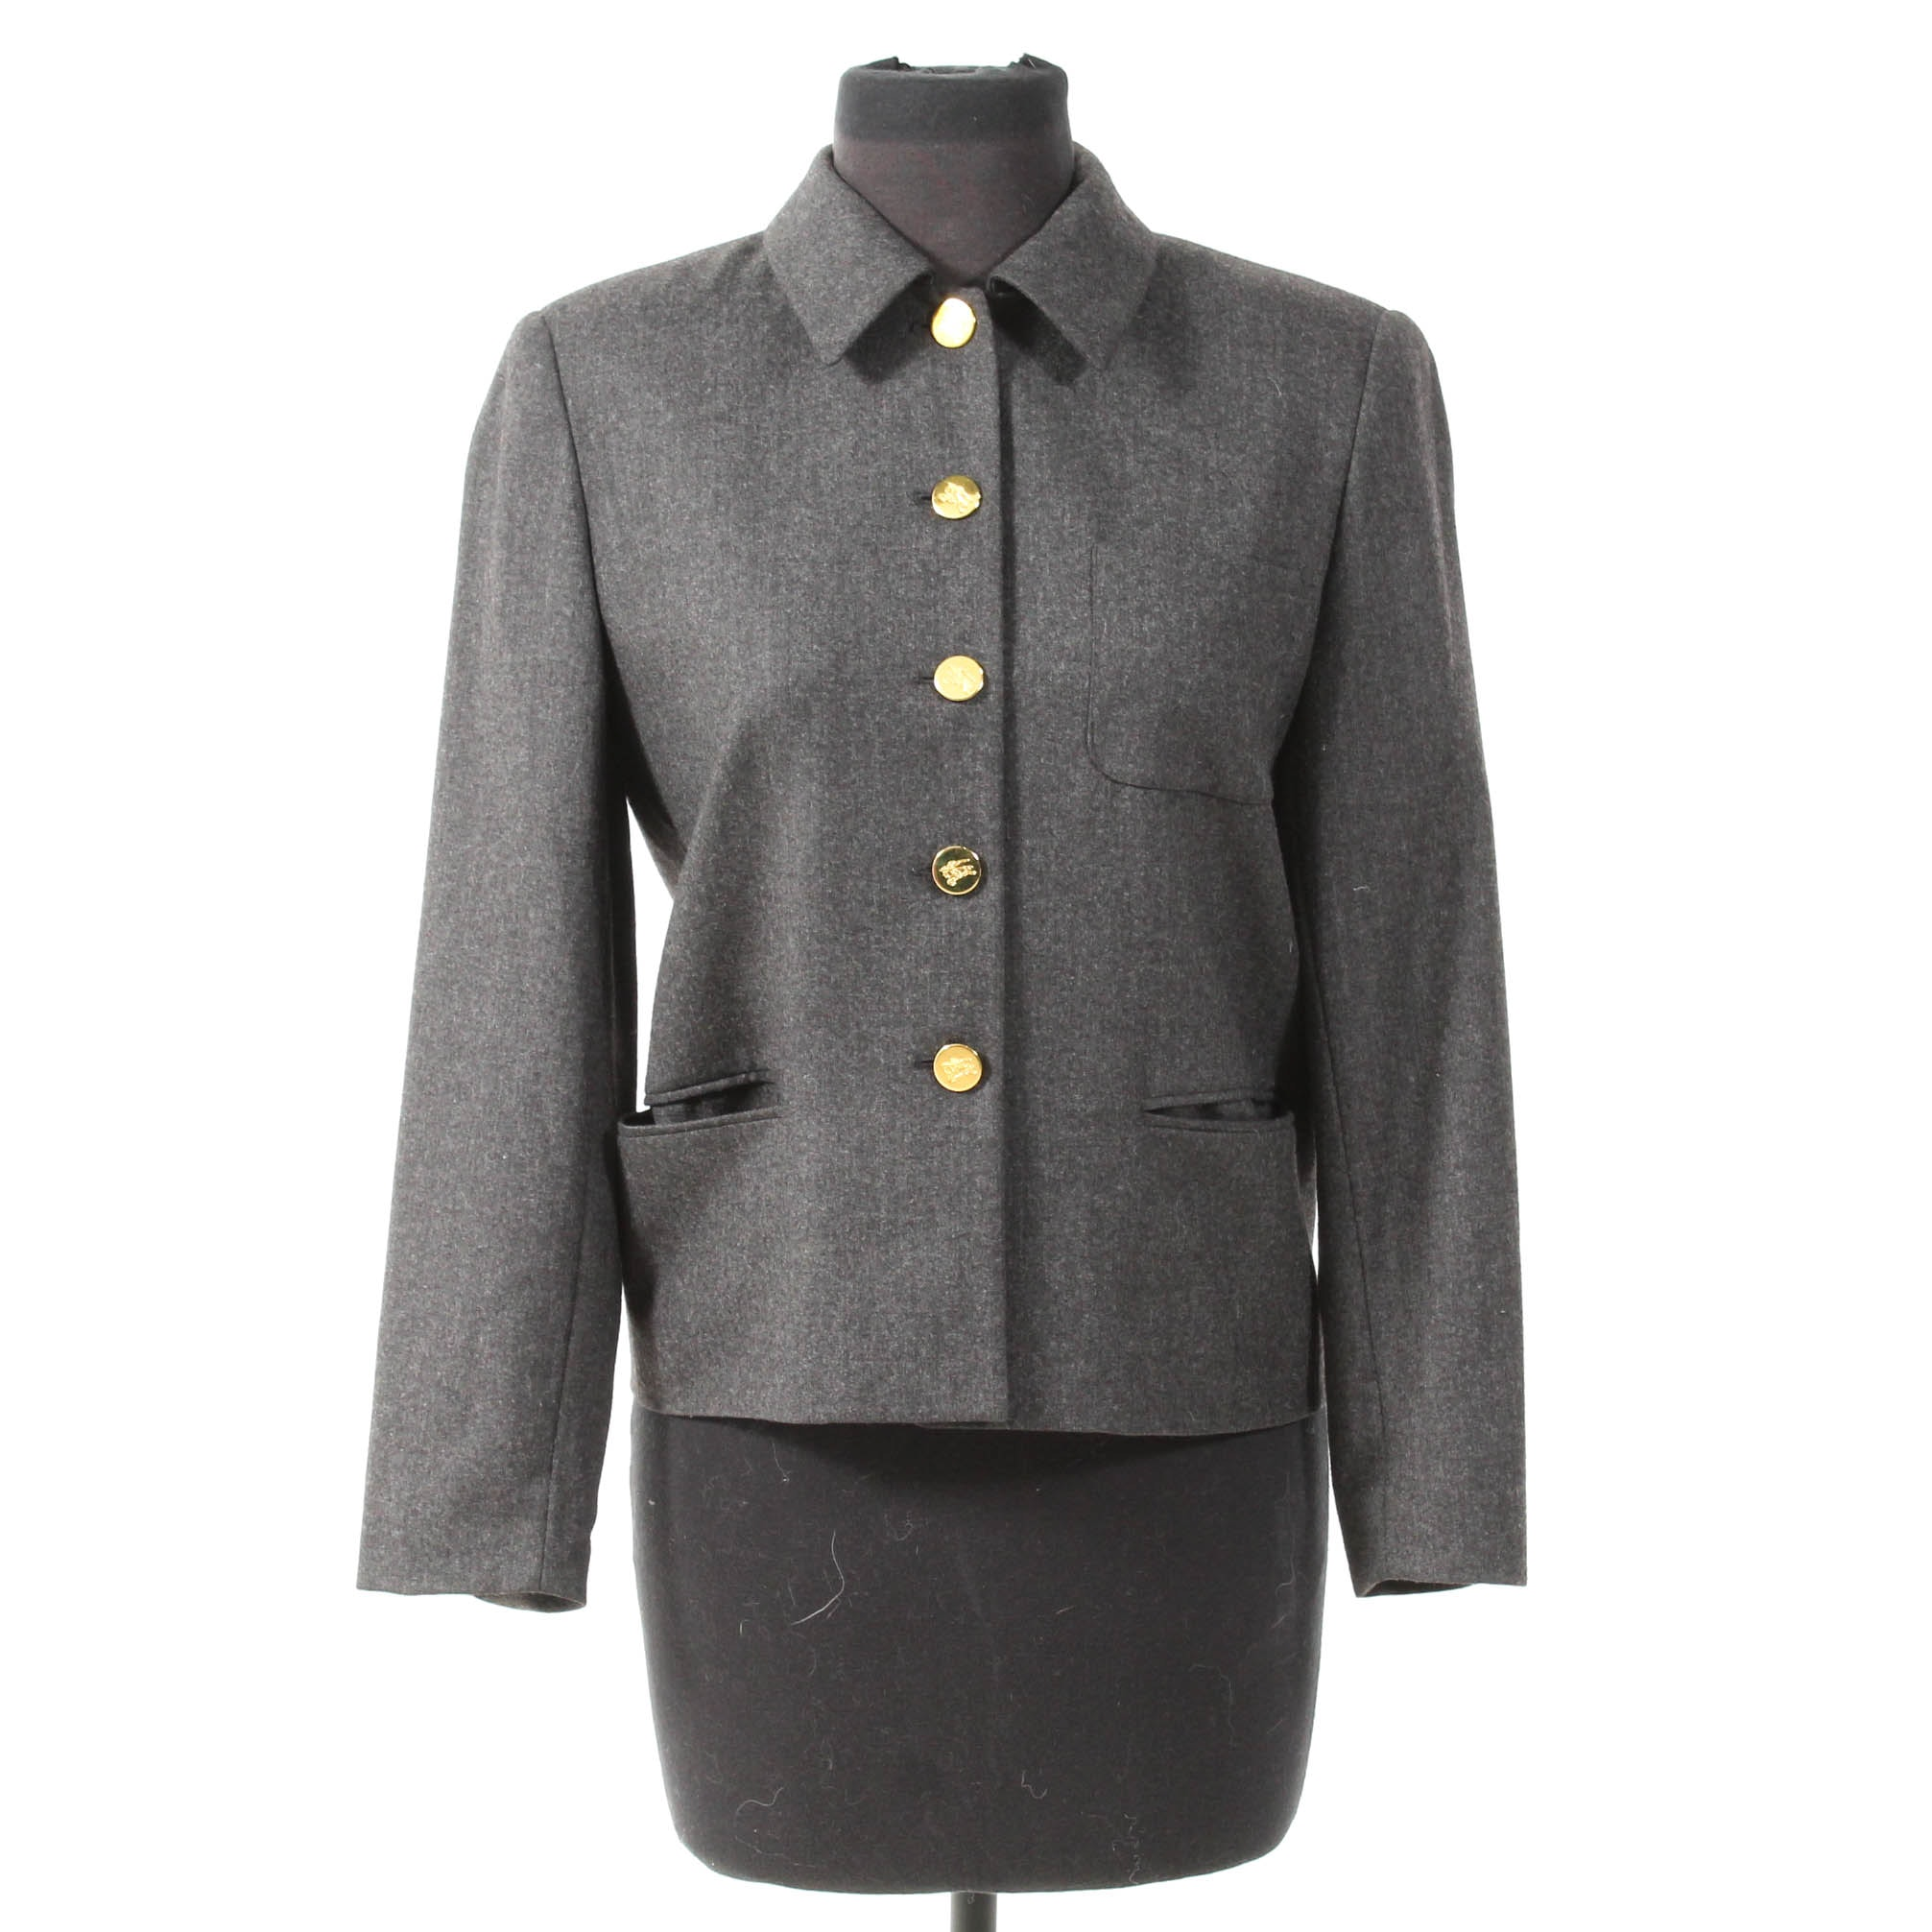 Vintage Burberry Gray Wool Blazer